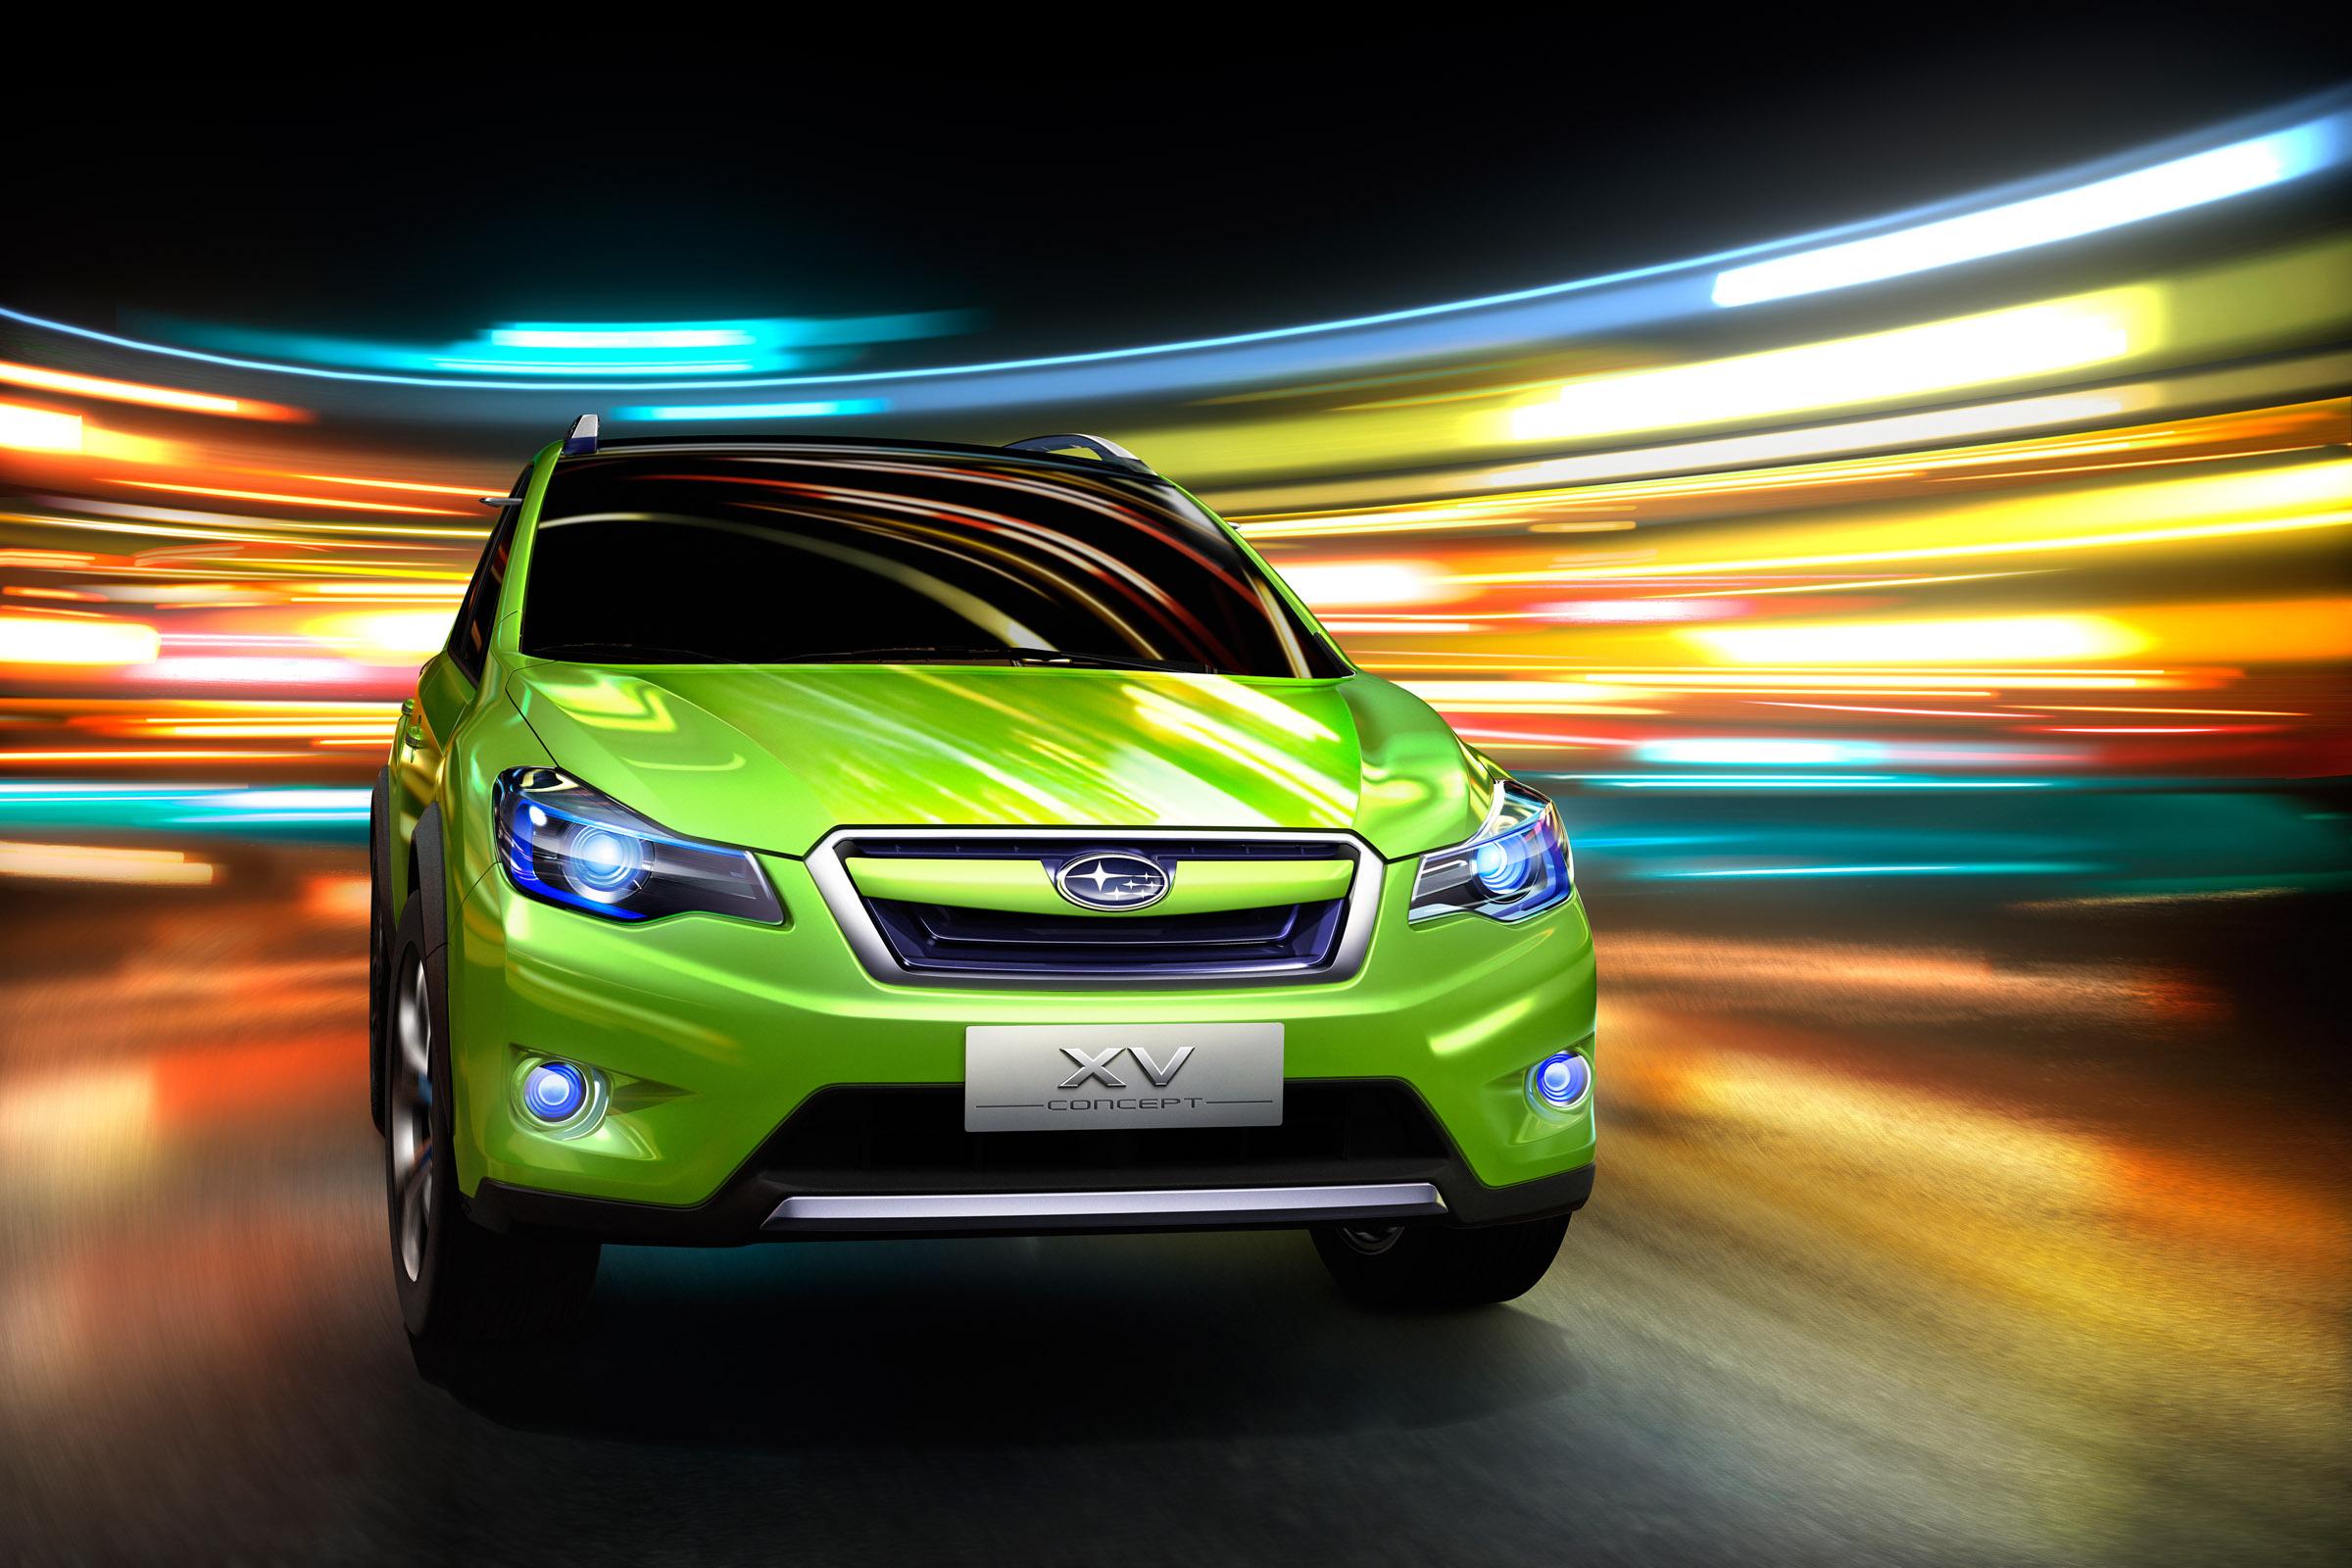 На проходящем в Шанхае автосалоне компания Subaru представила